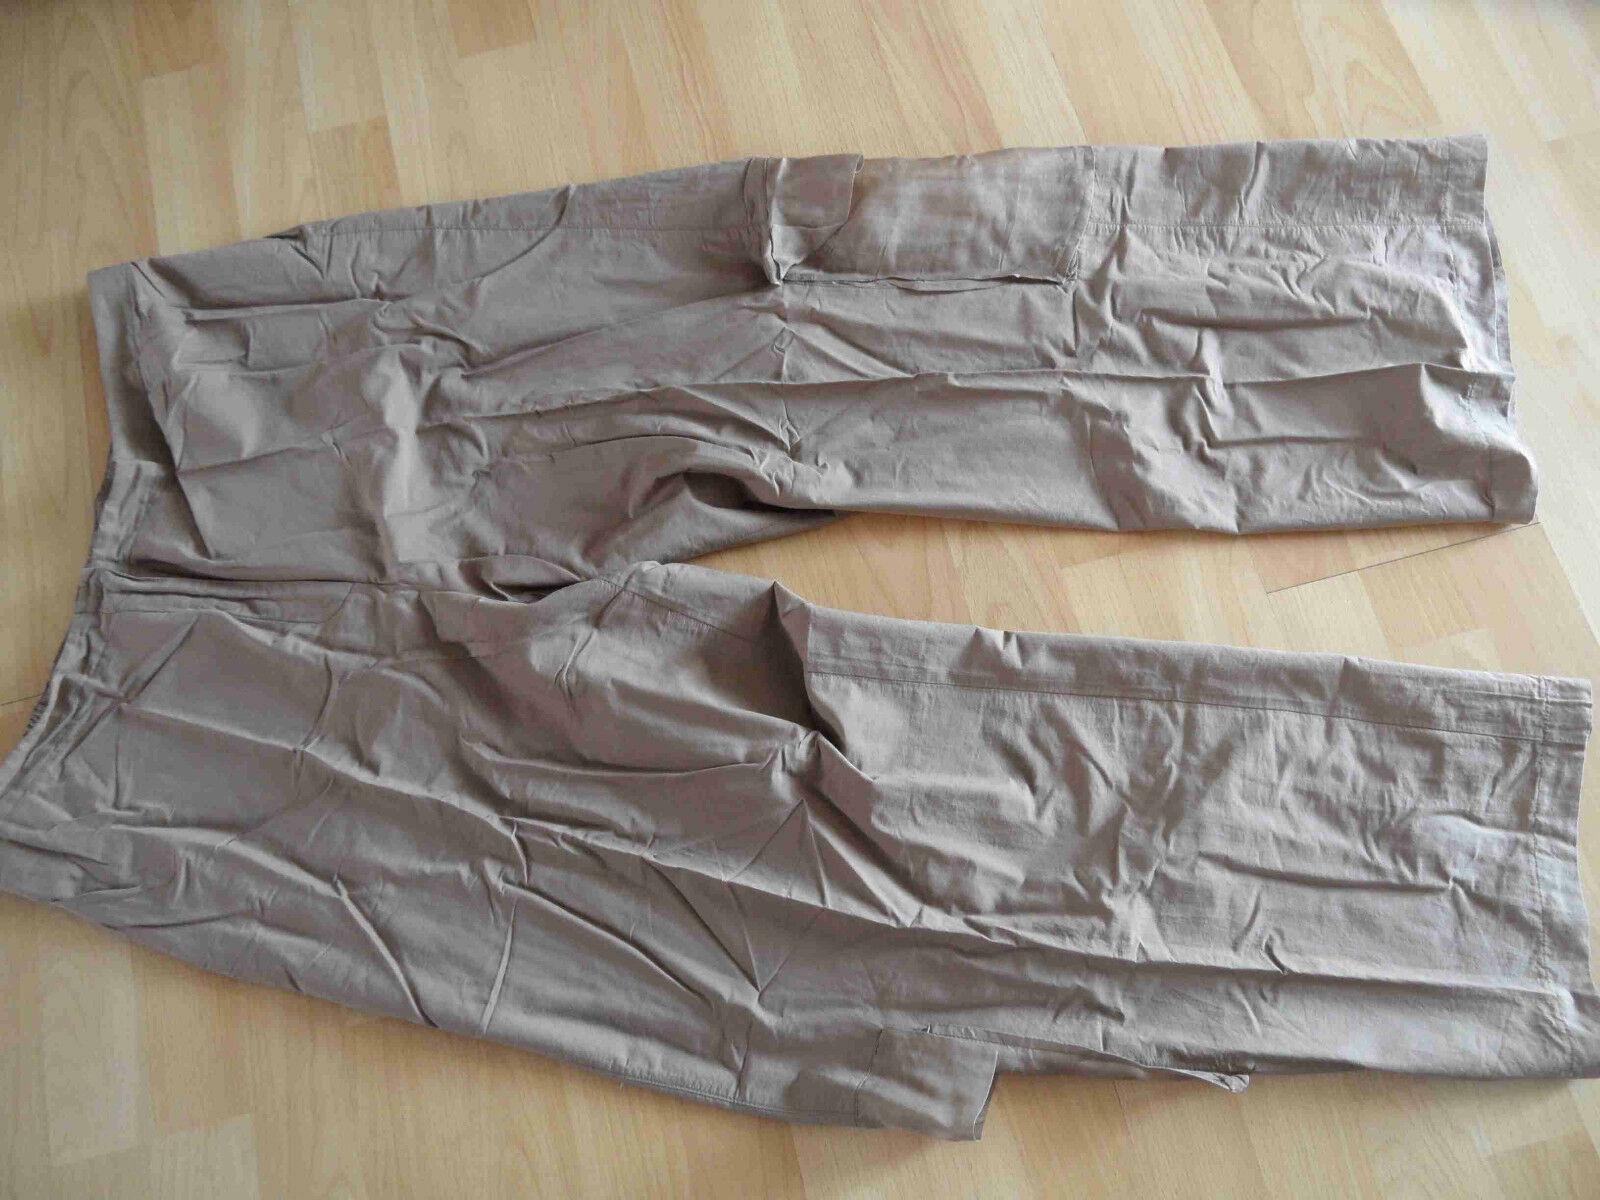 Absolut by Zebra Light Balloon Pants with Side Pockets braun Größe 3 New (HMI 414)